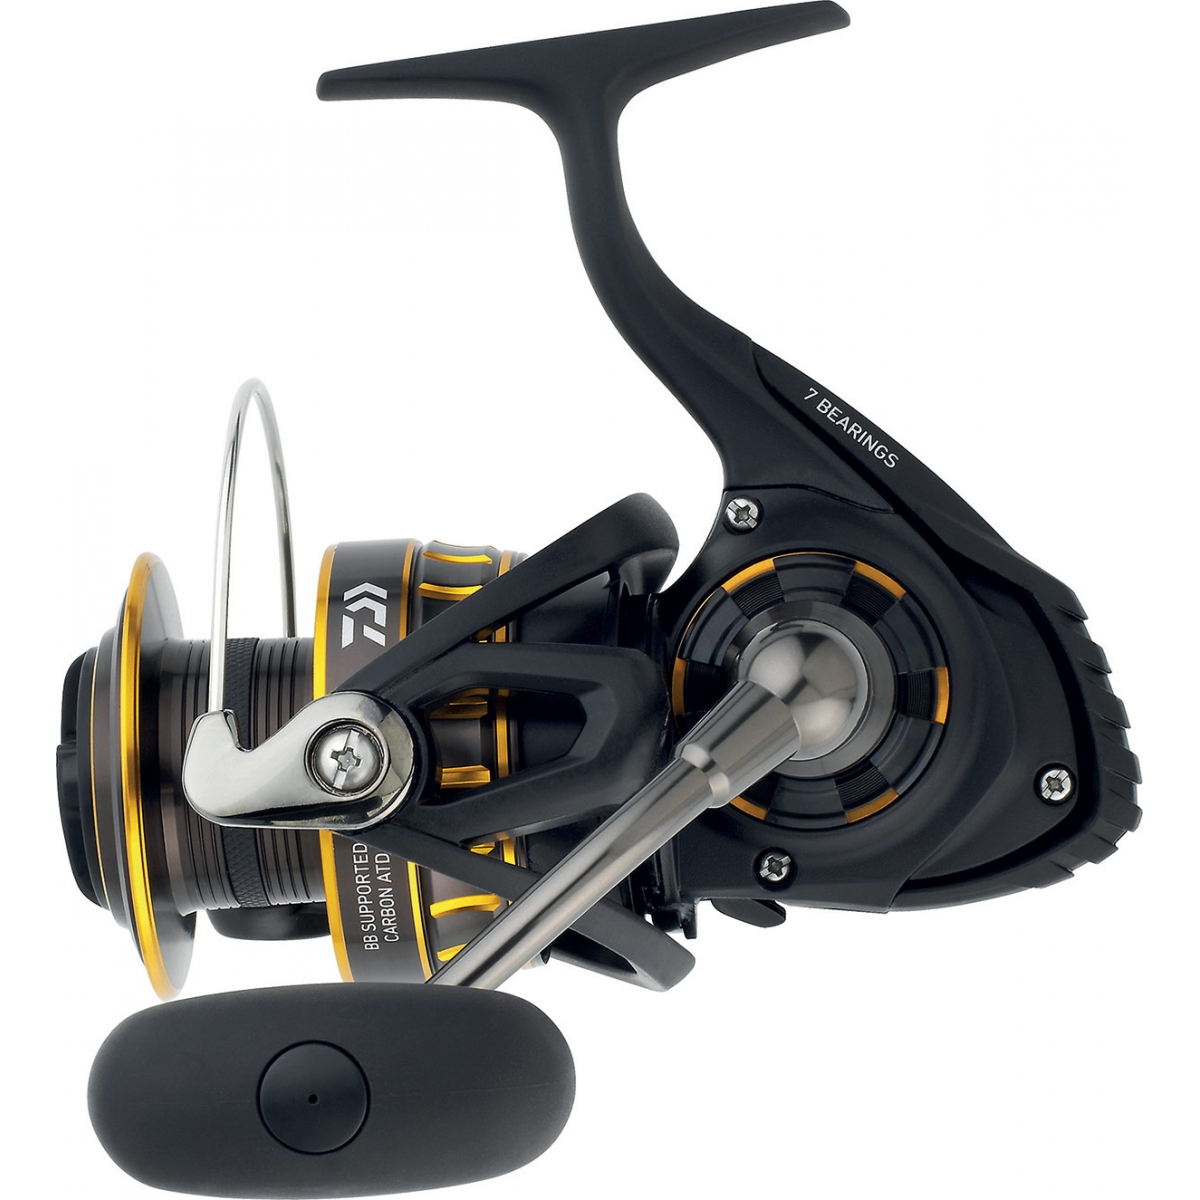 crankys moulinet spinning daiwa BG black gold pêche spinning